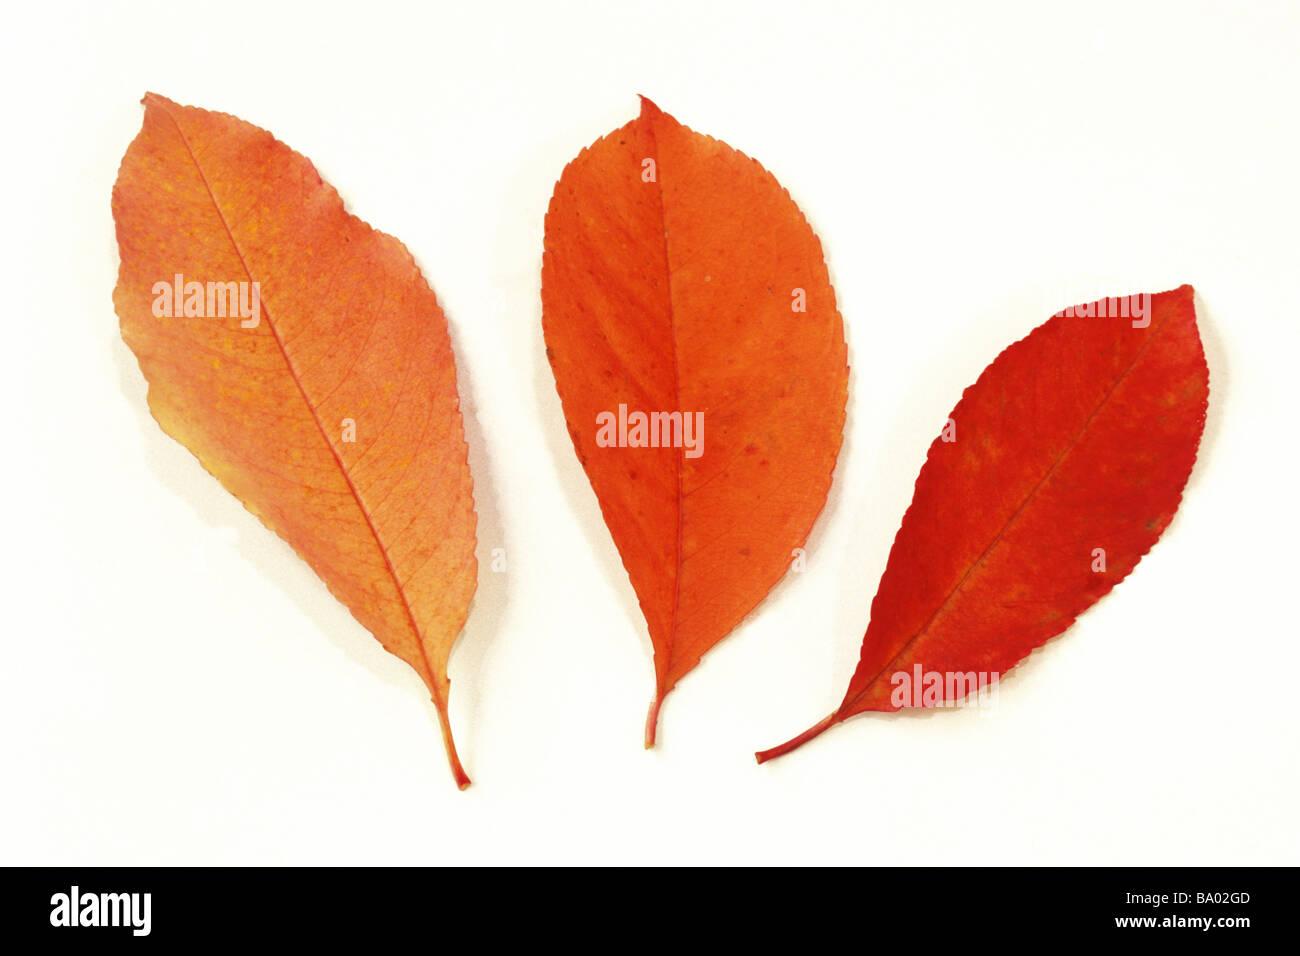 Bird Cherry Prunus padus tres hojas en otoño colores studio picture Foto de stock